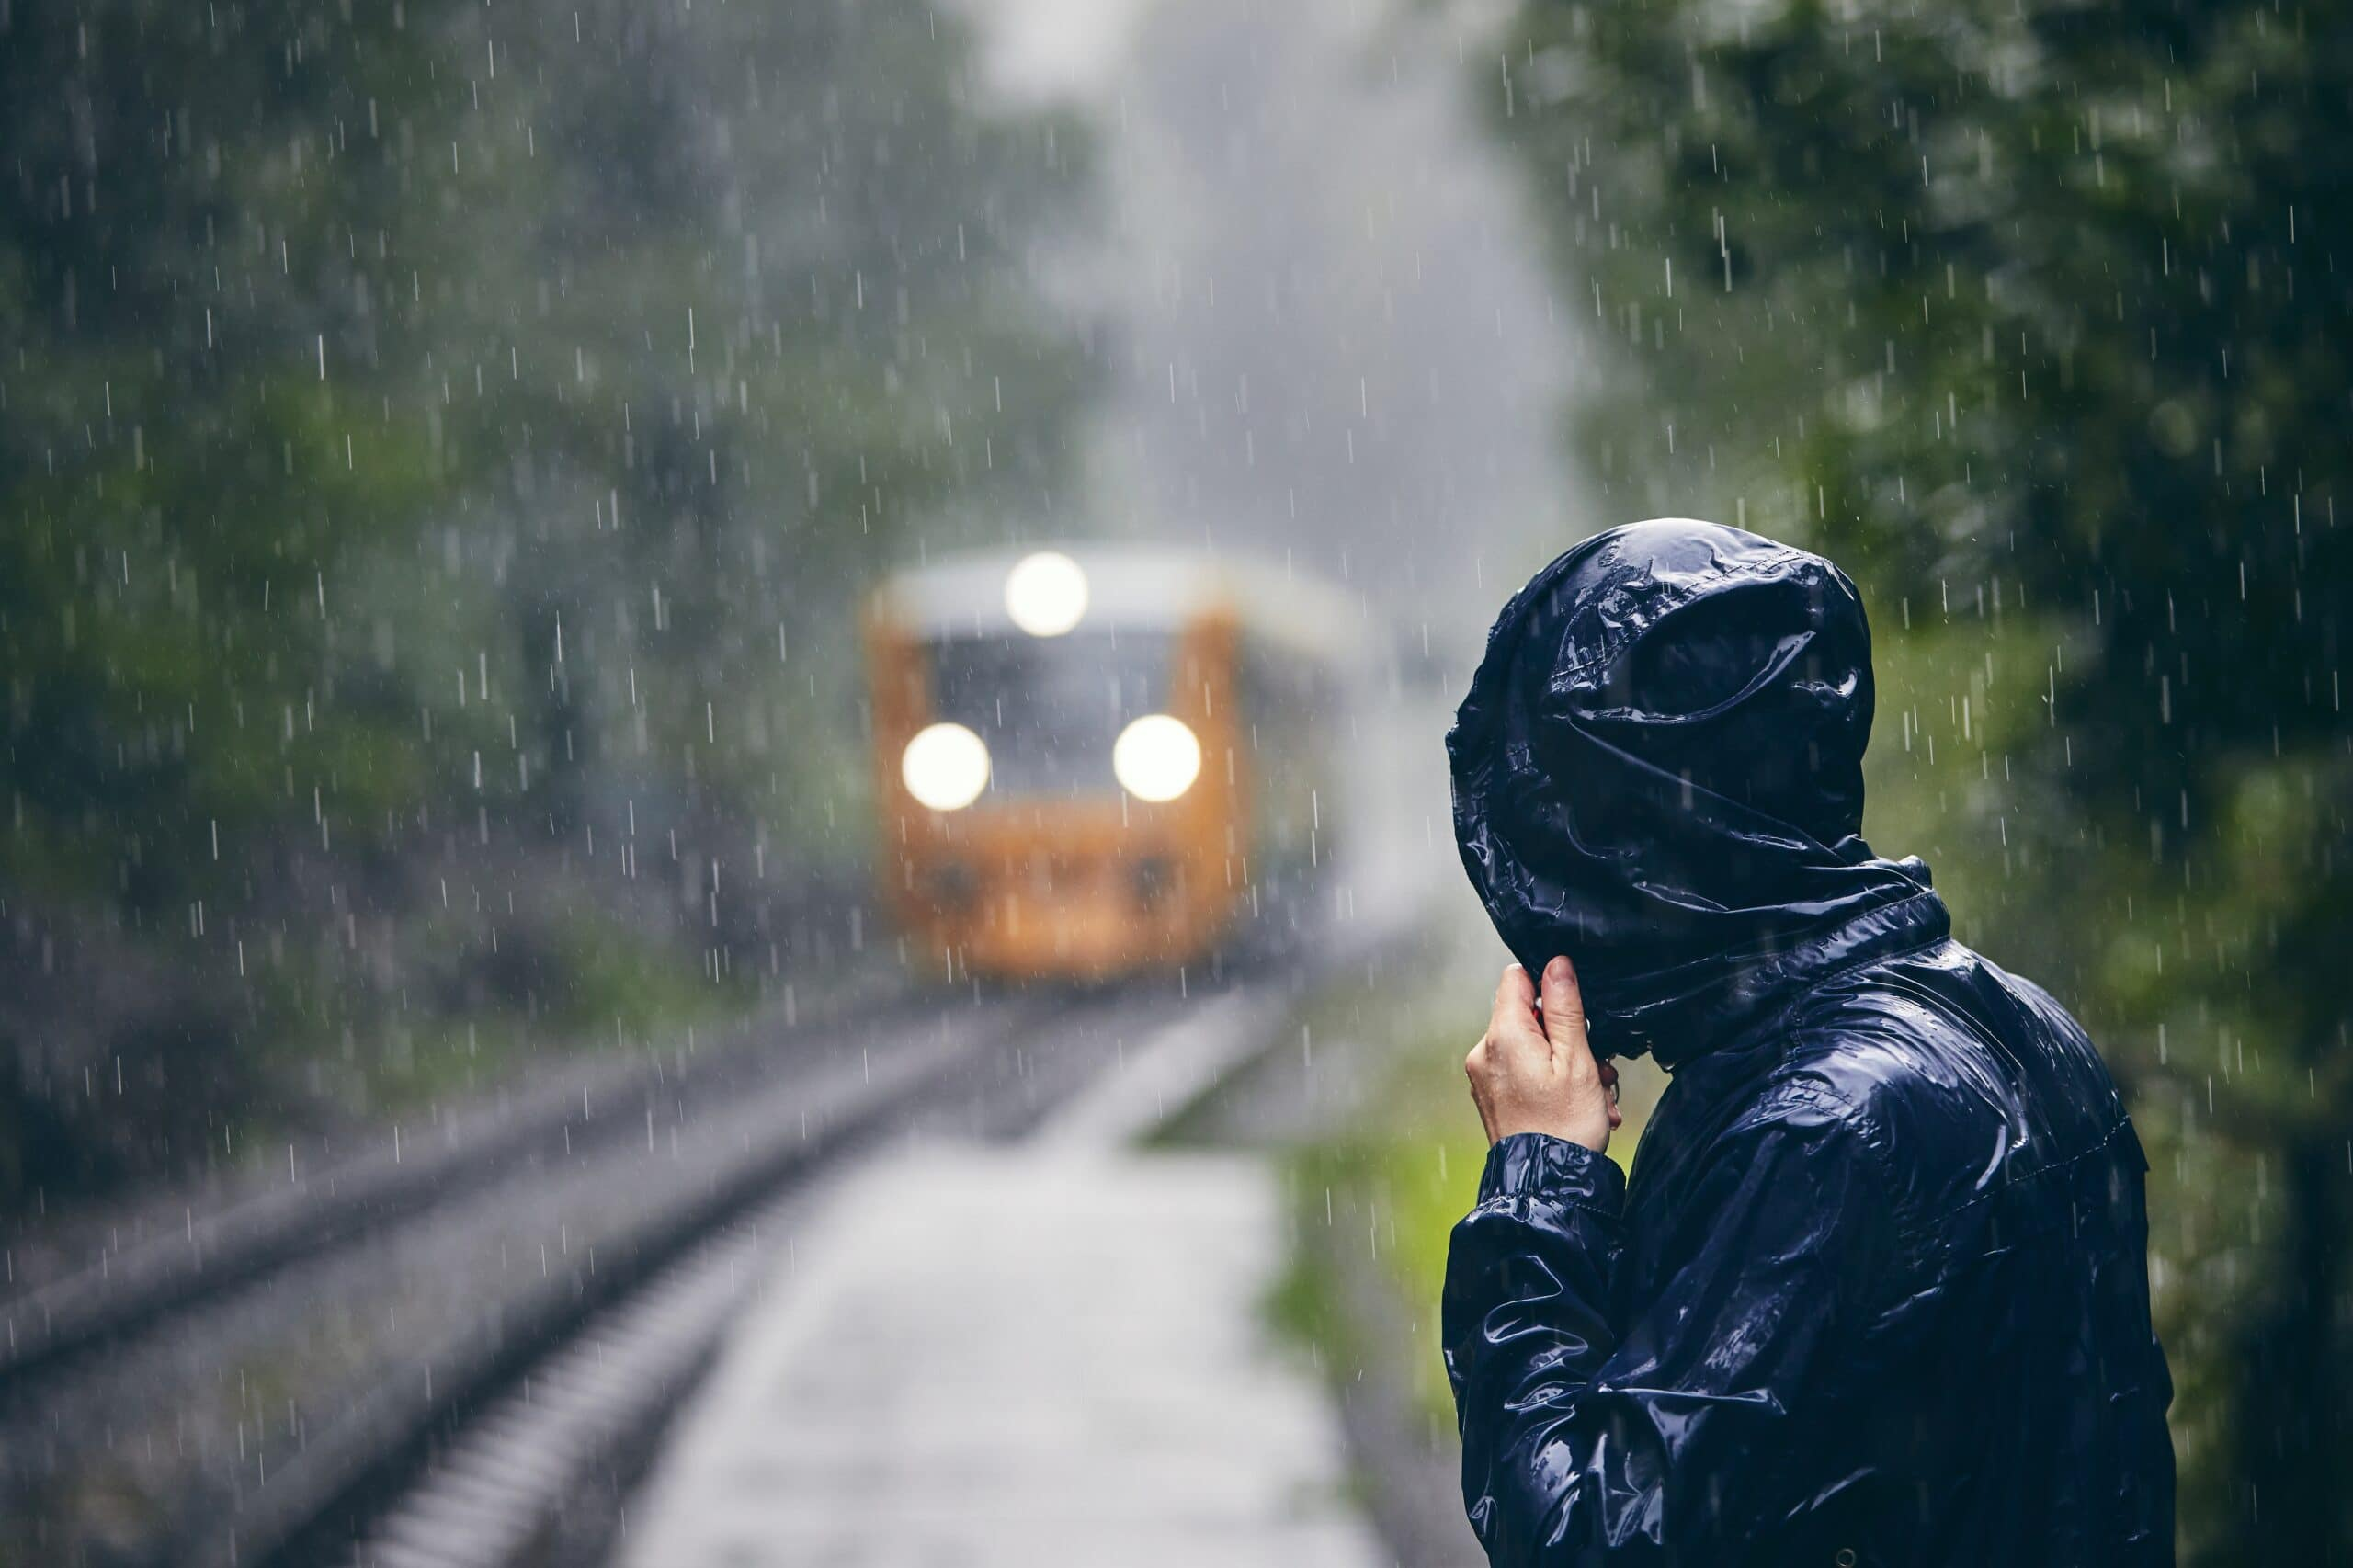 Hevige regenval